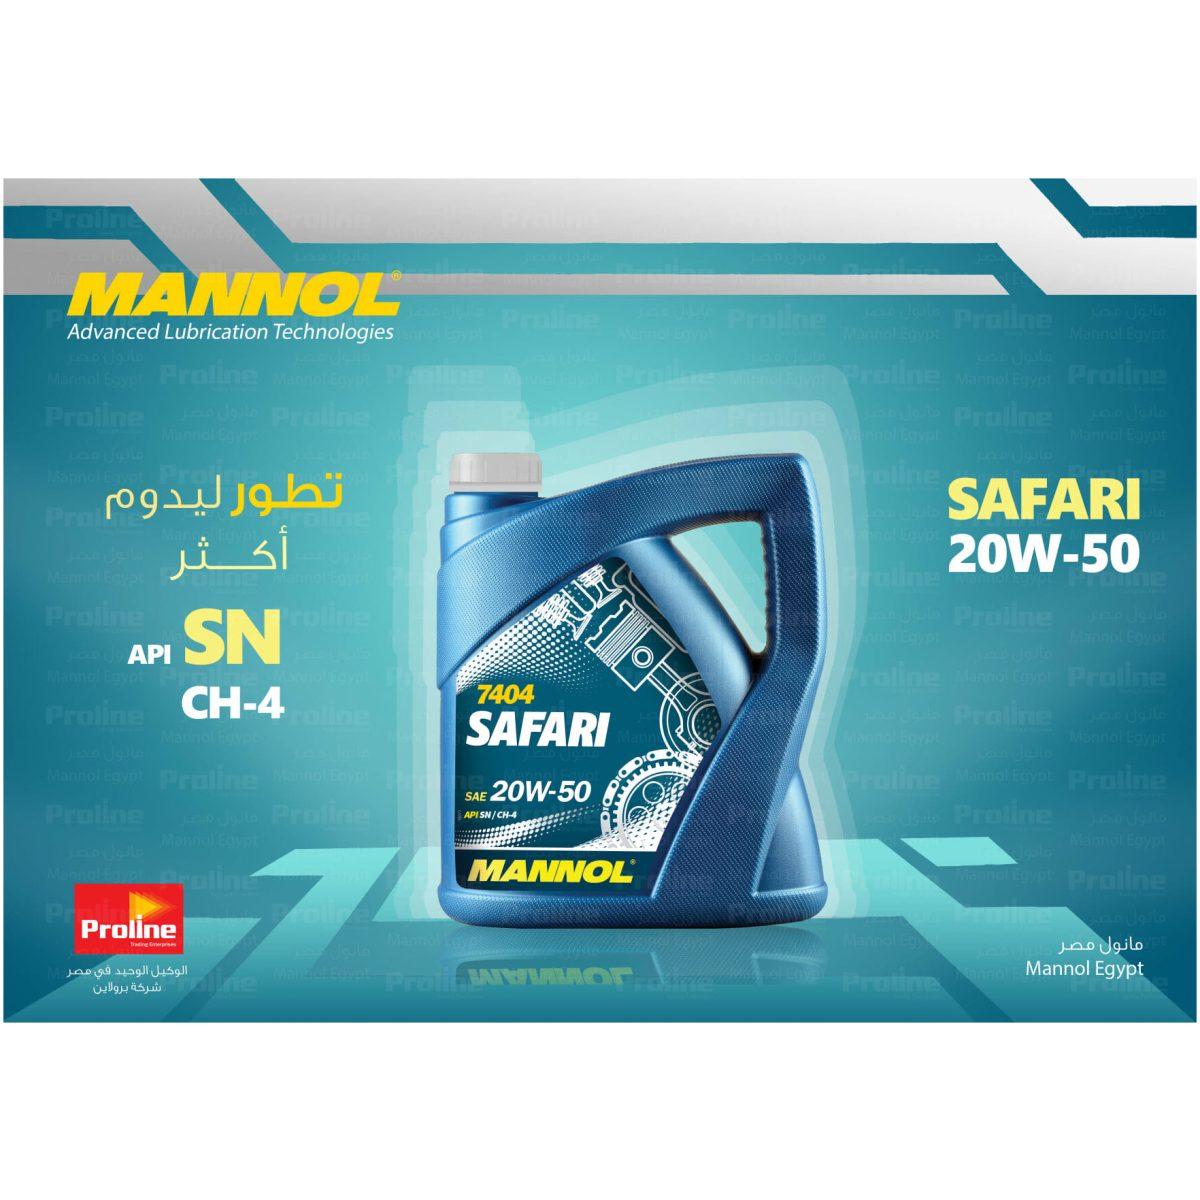 Safari 7404